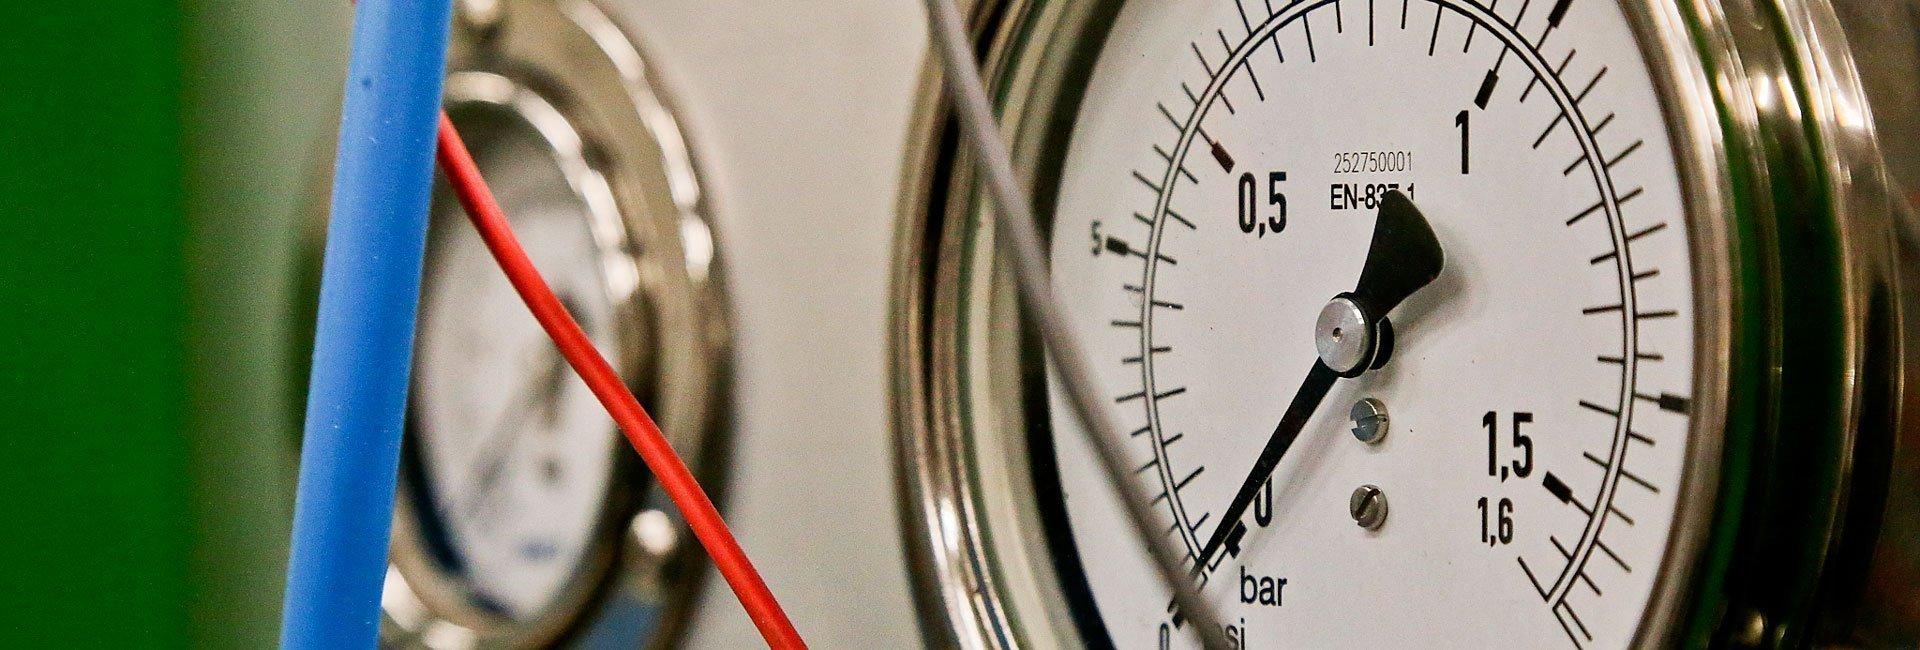 valve maintenance equipment